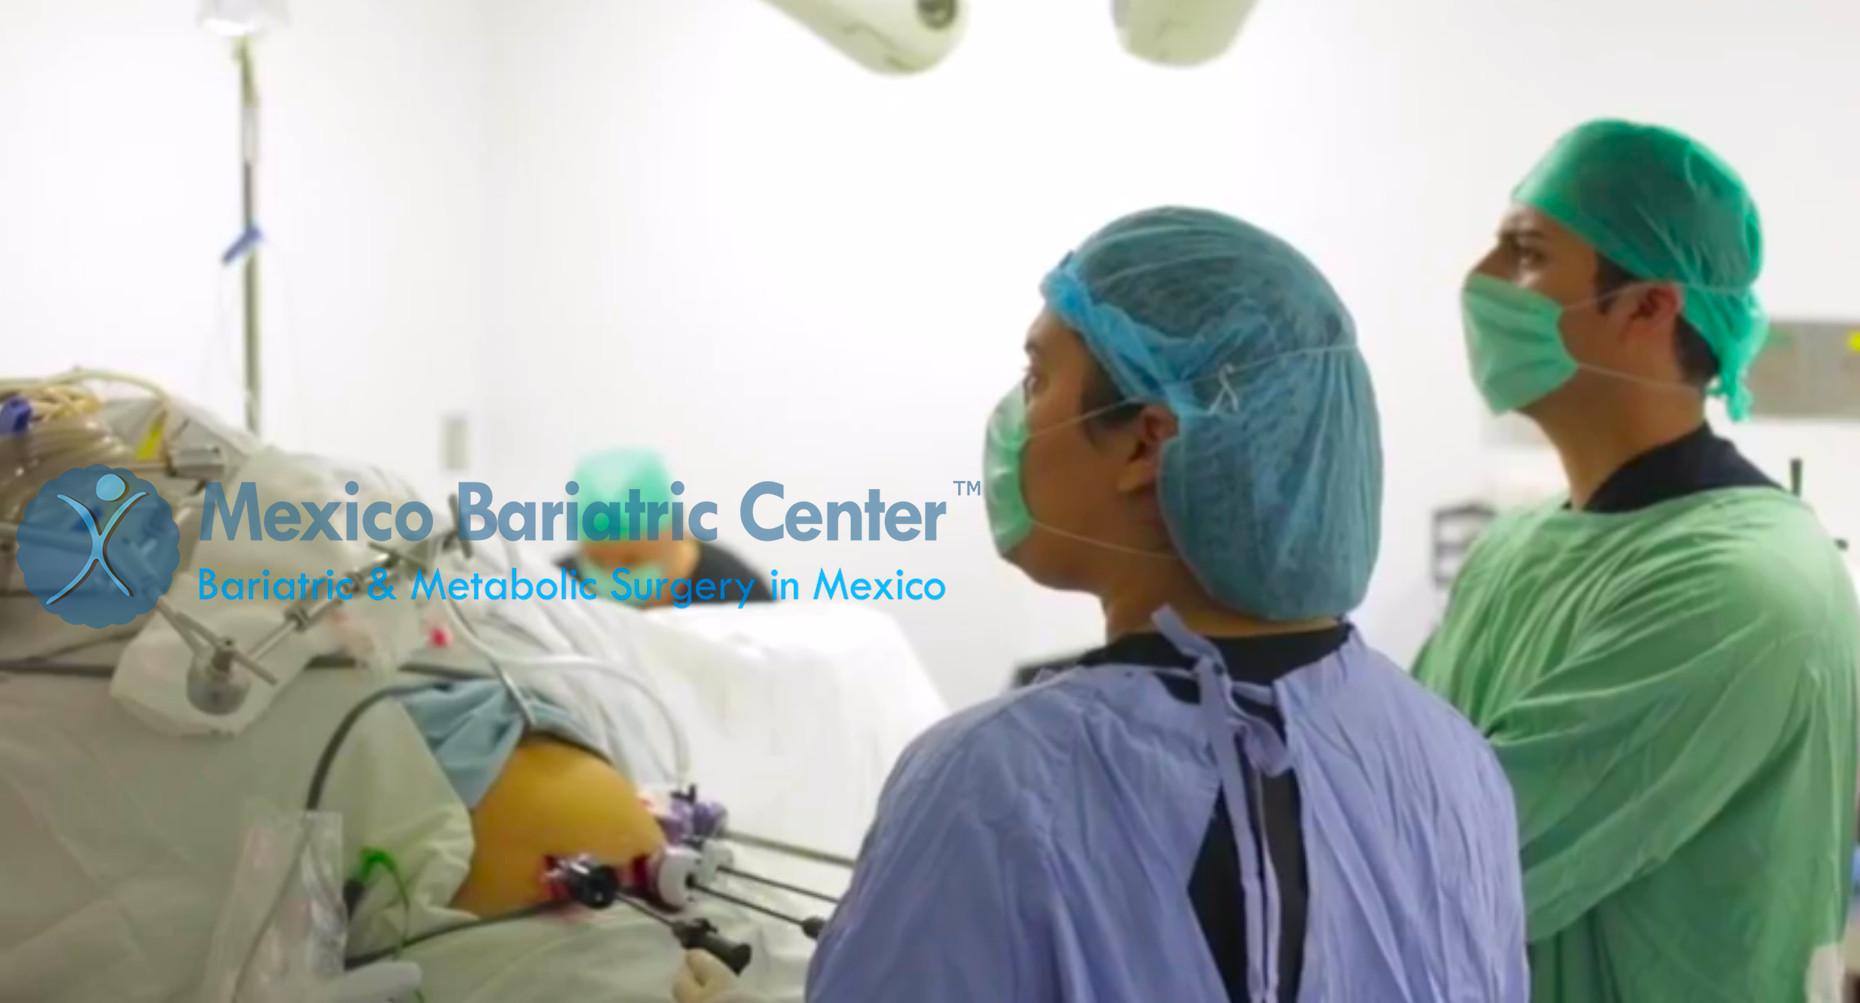 Dr. Louisiana Valenzuela Performing Surgery - Mexico Bariatric Center